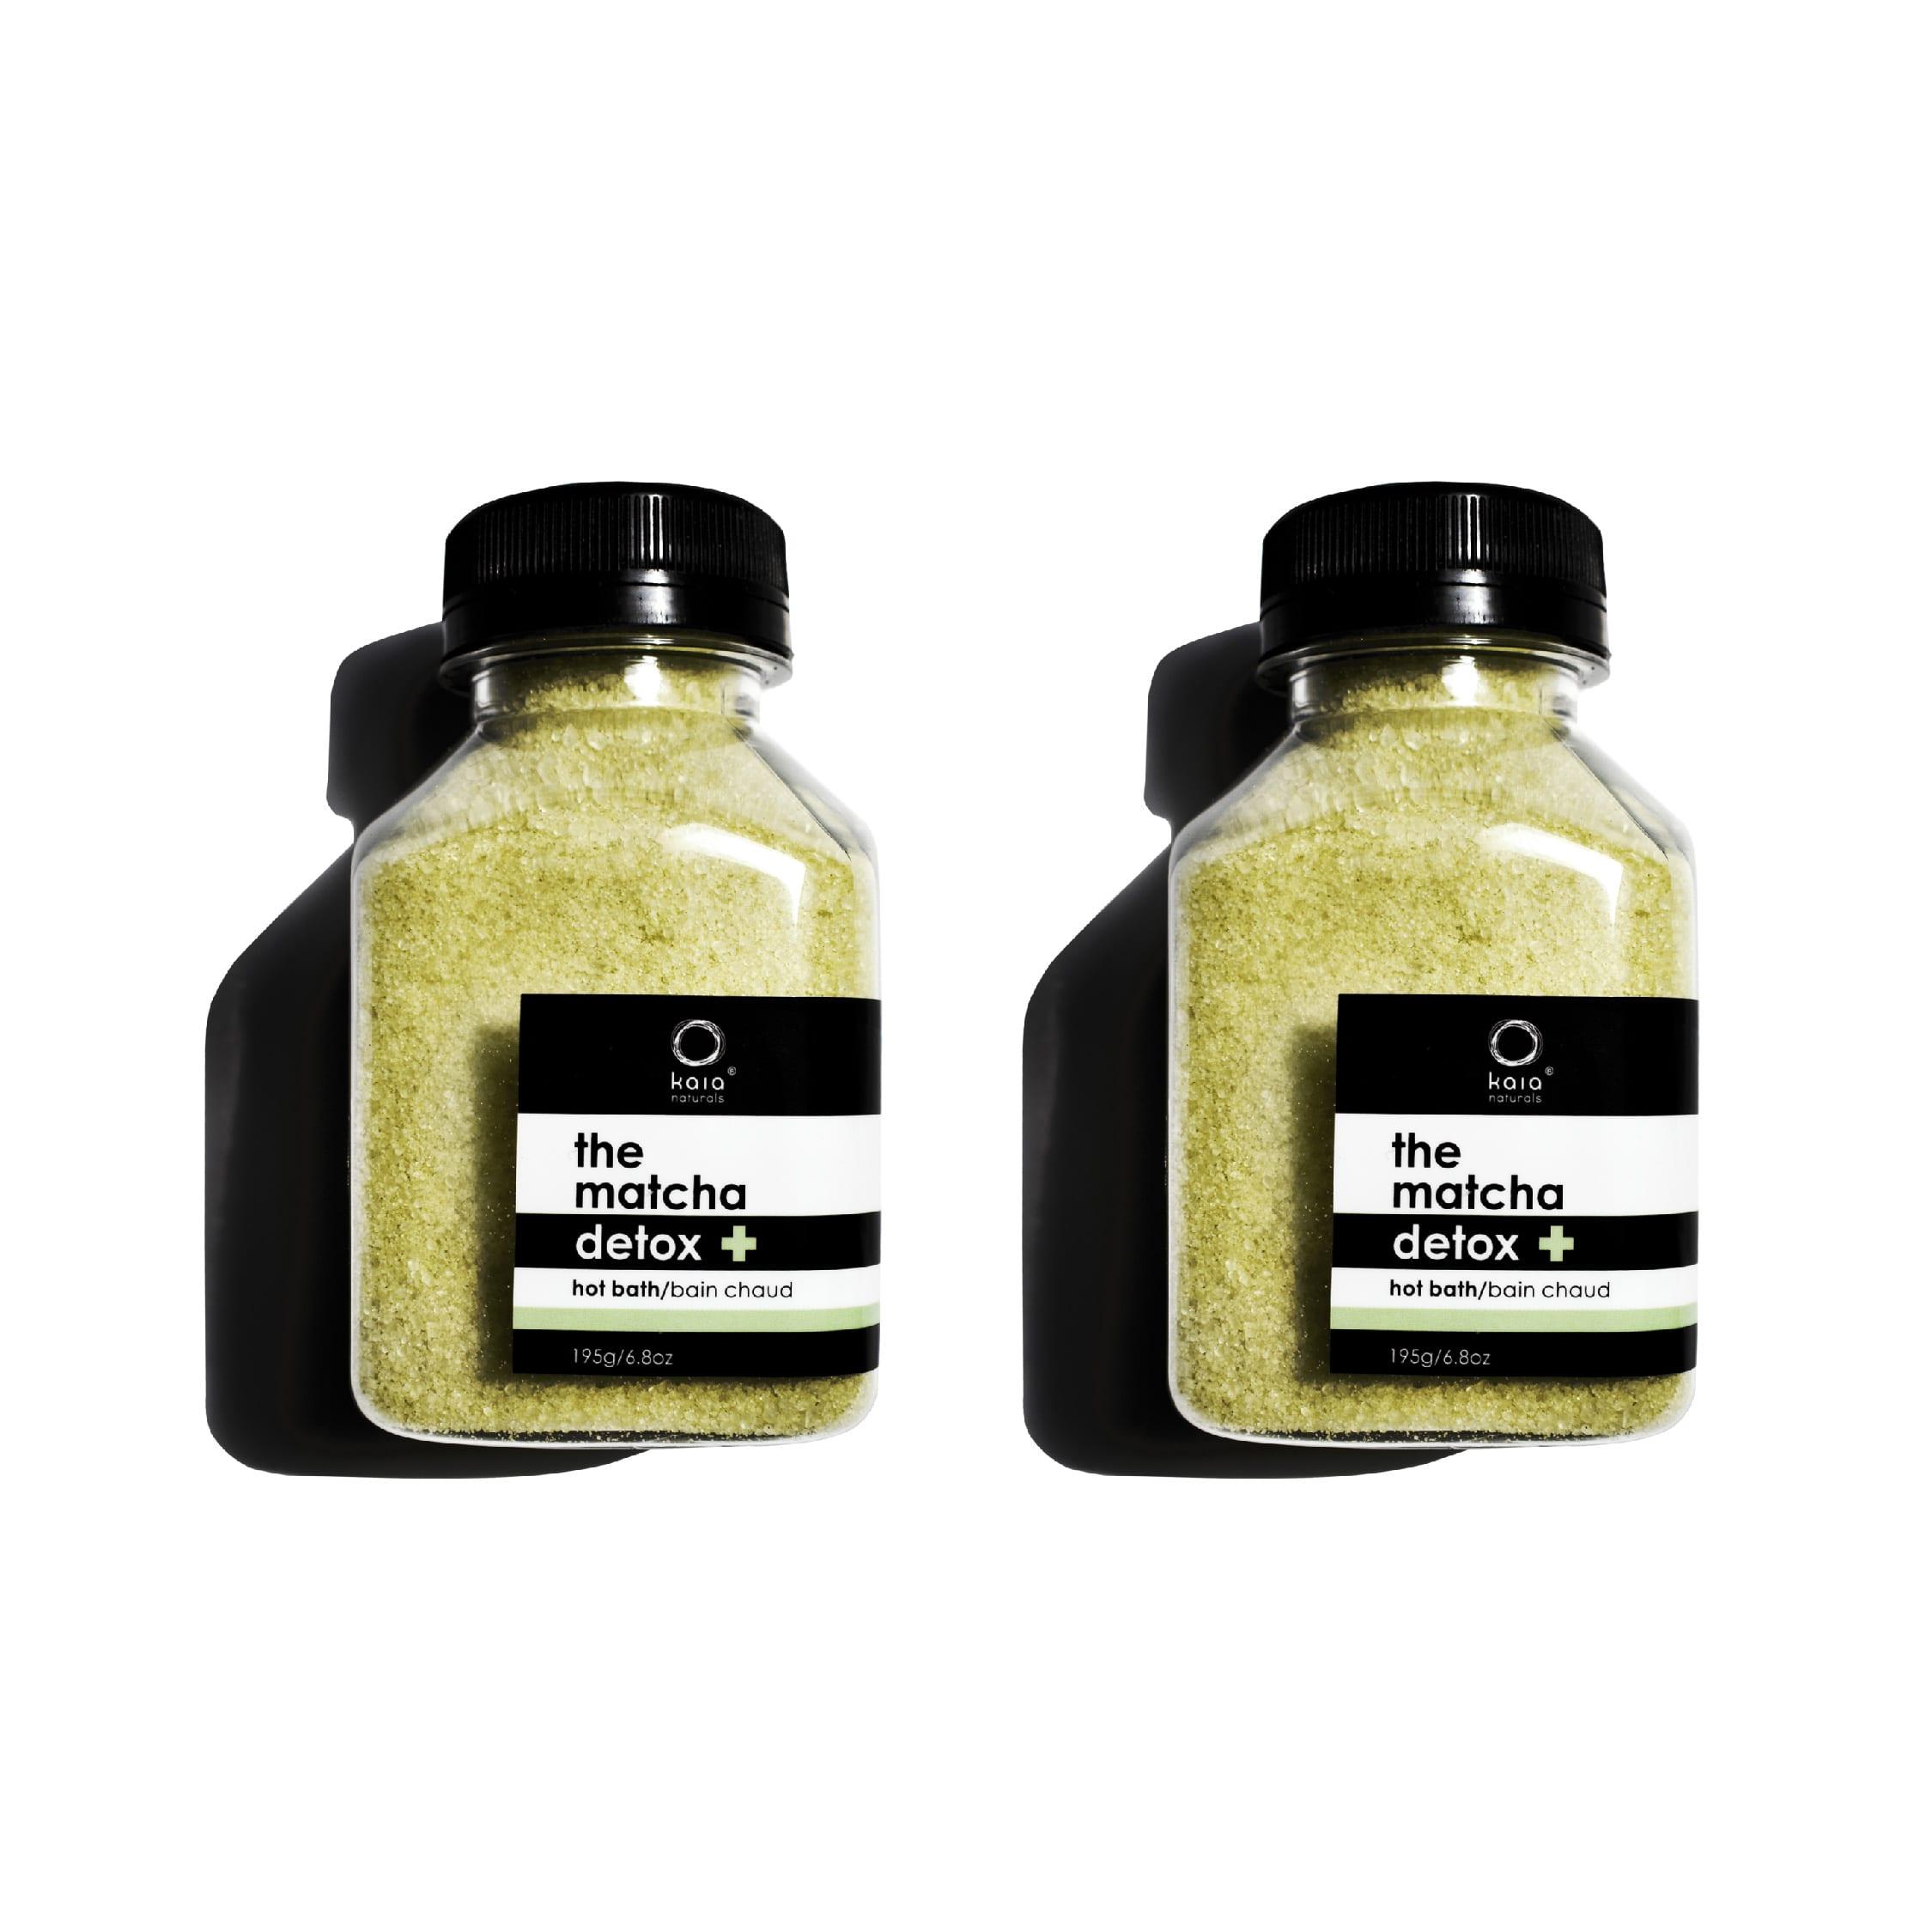 2 for 25 turmeric detox hot baths bundle